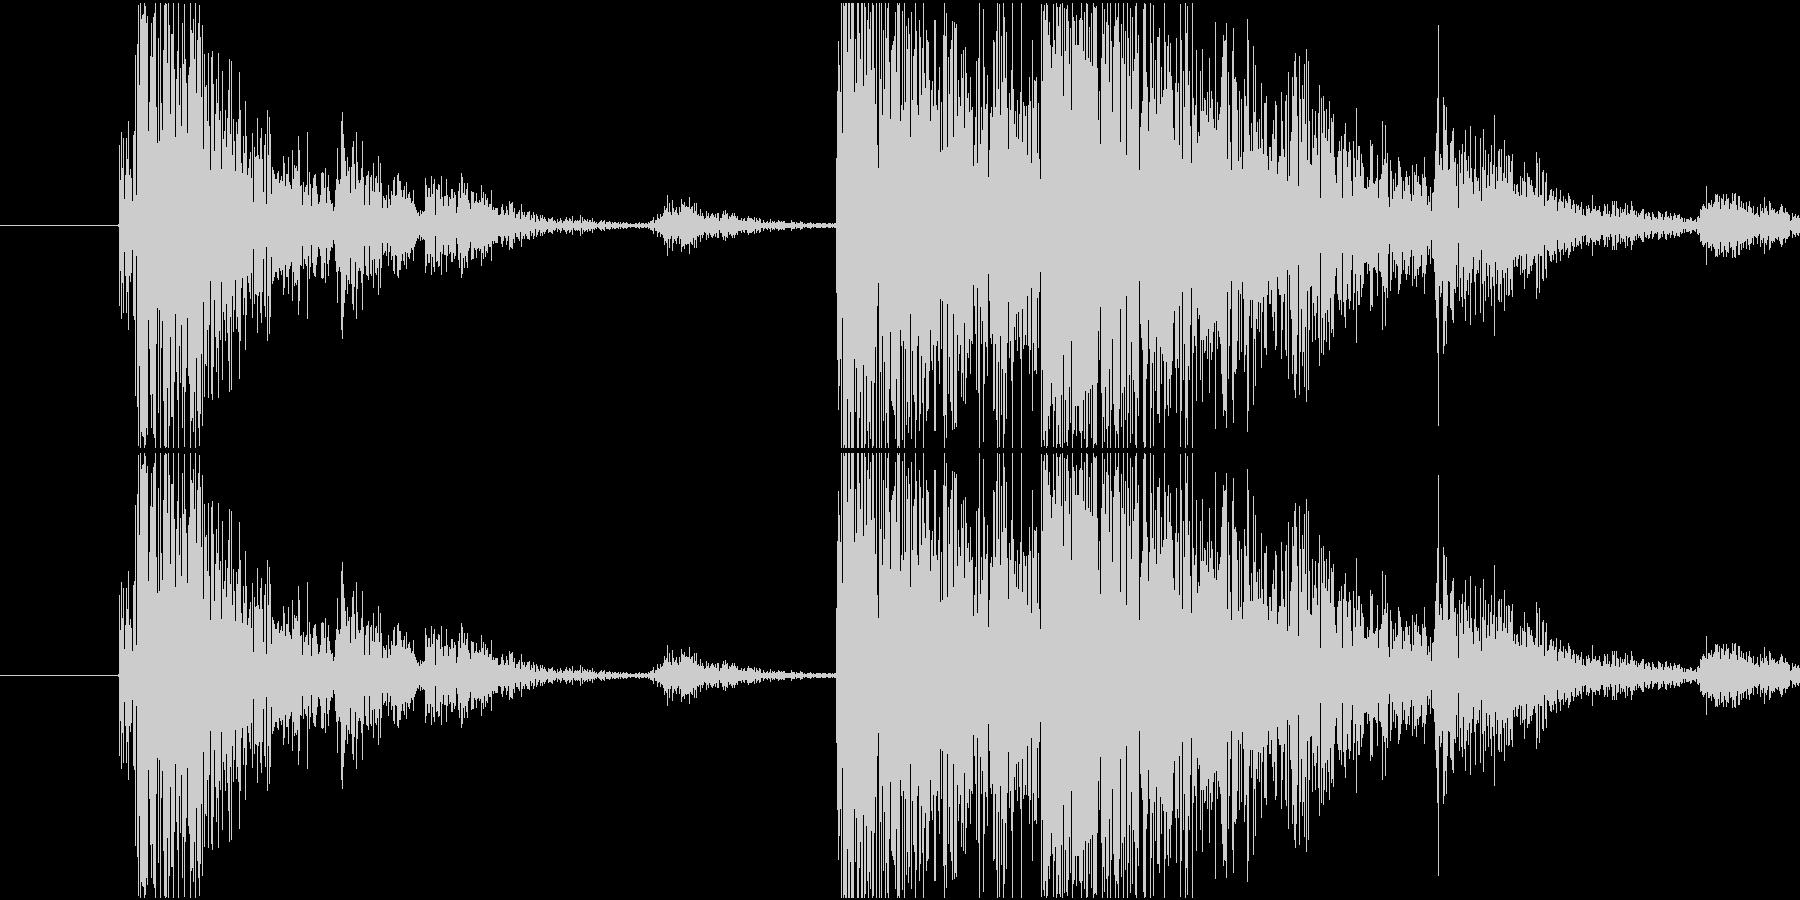 Material 工具を軽く投げ置く音の未再生の波形